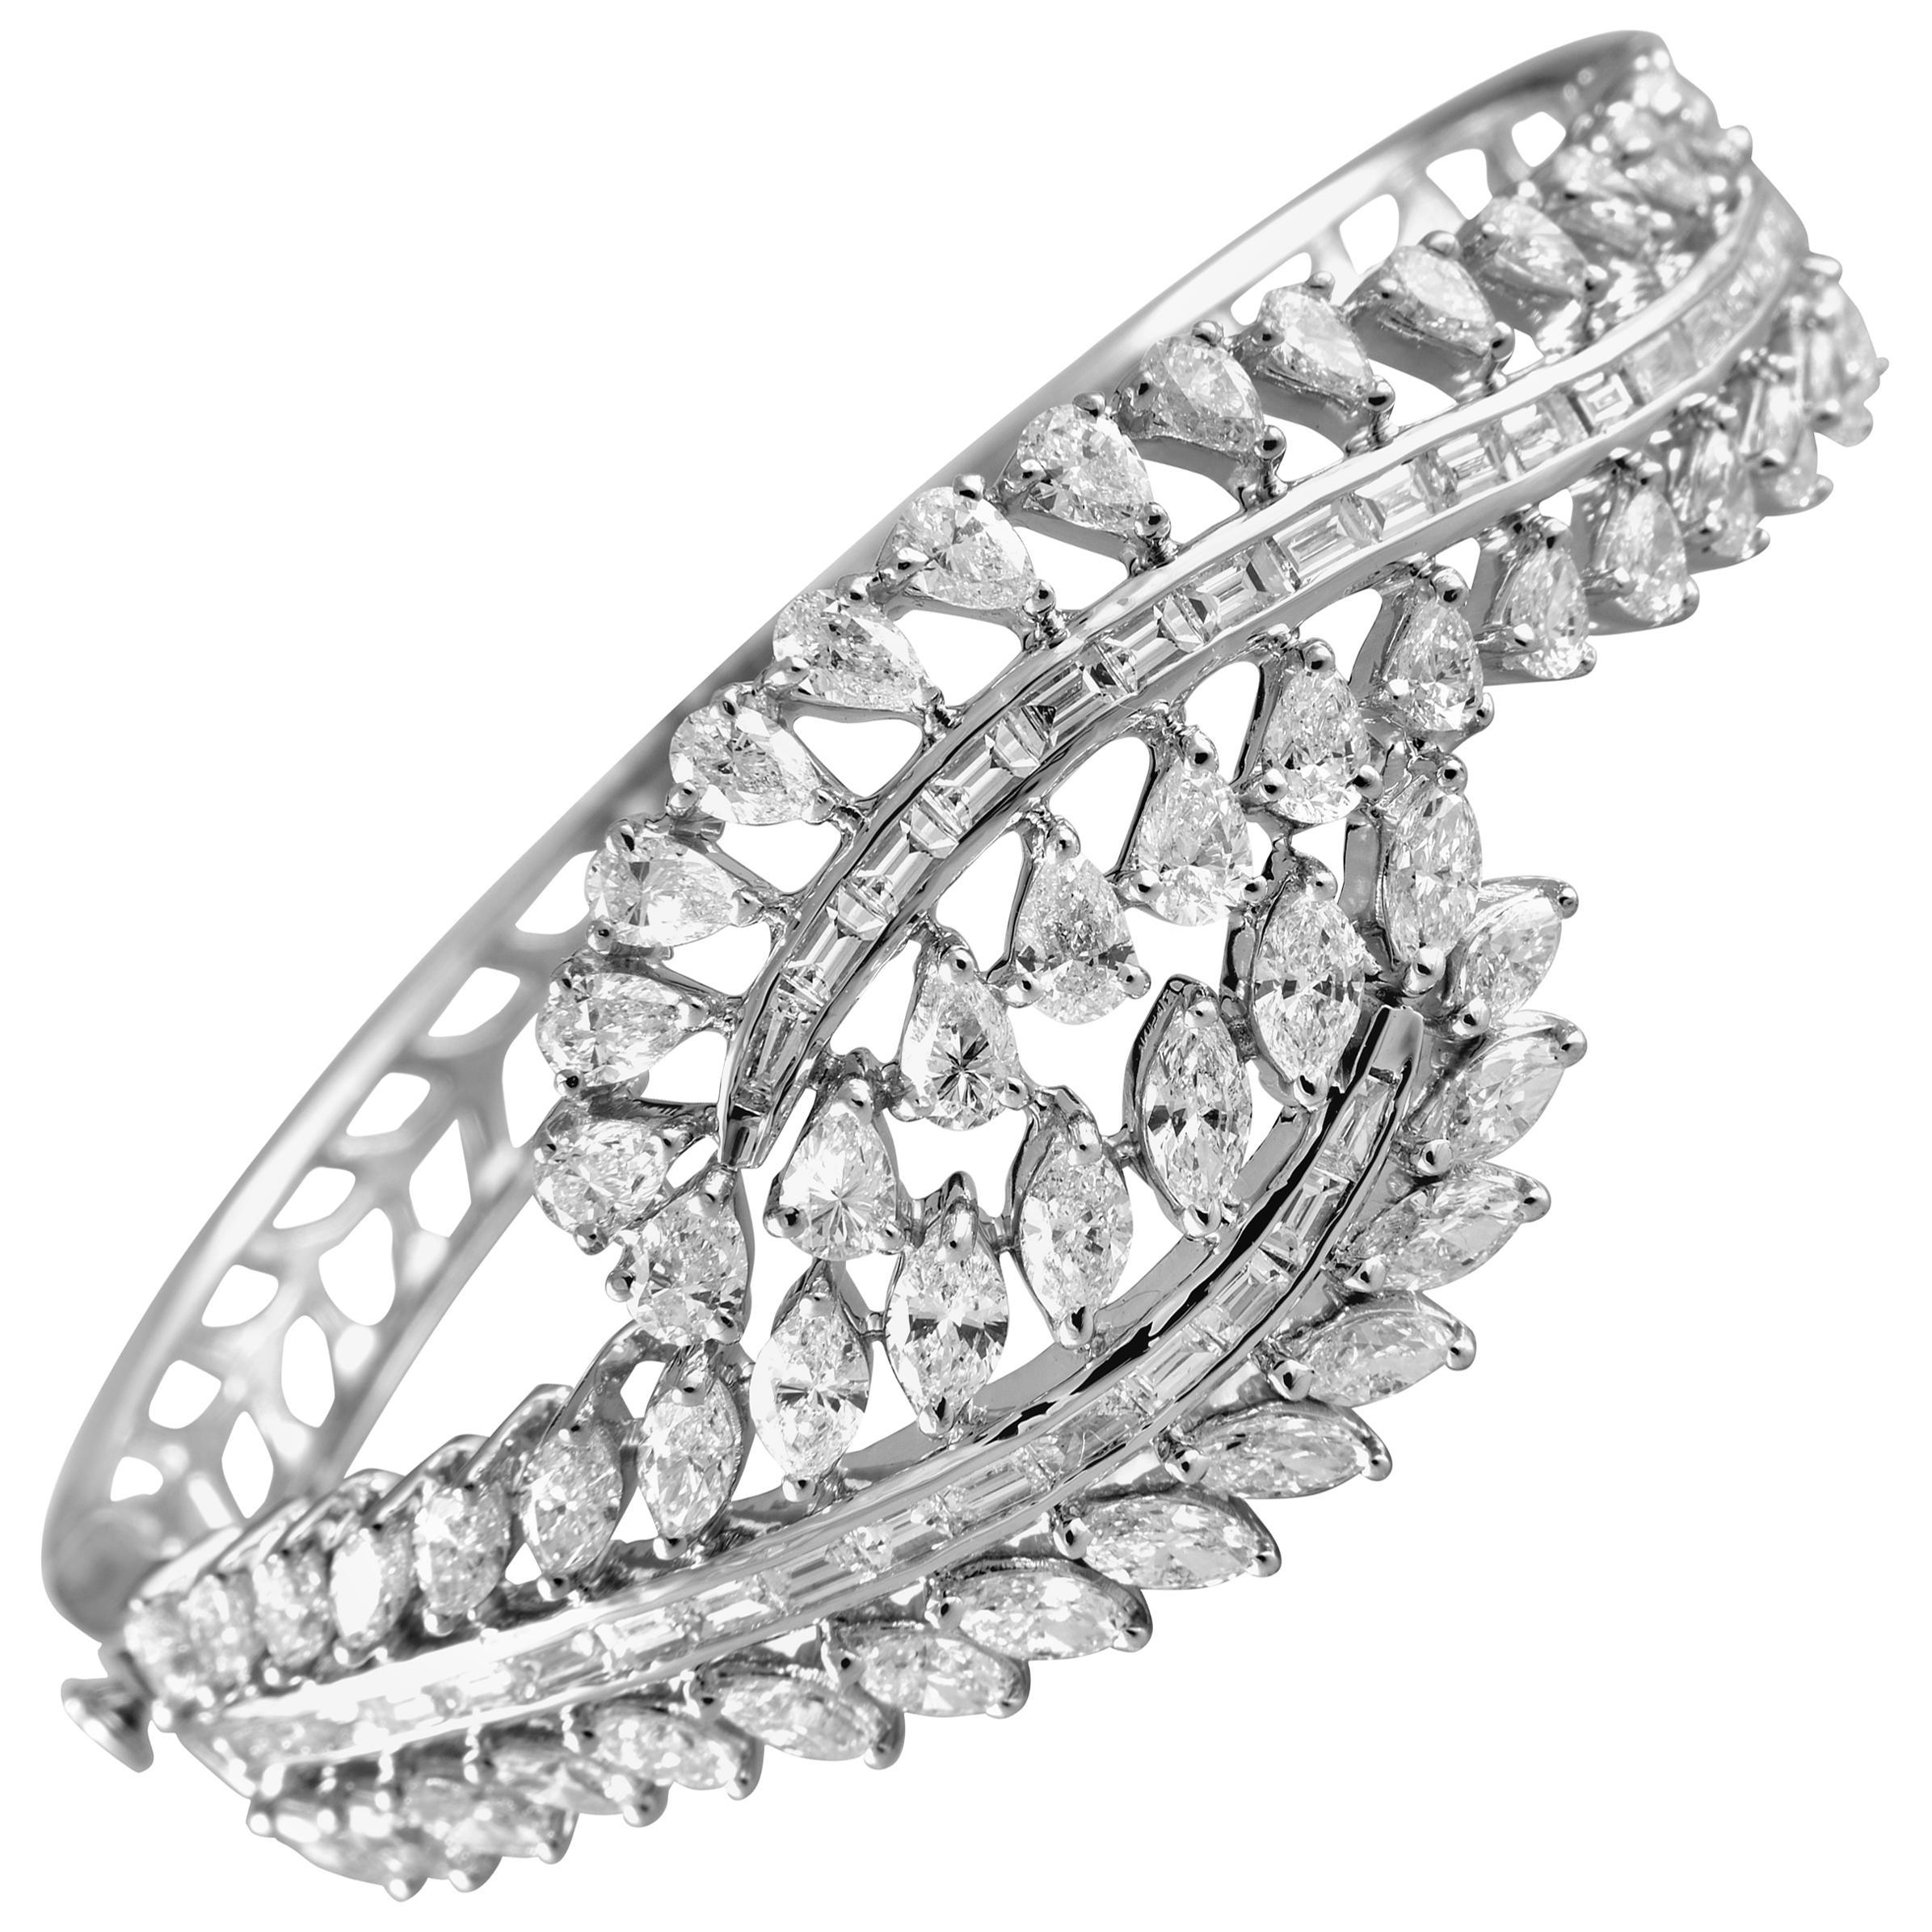 18 Karat White Gold White Diamond Bangle Bracelet